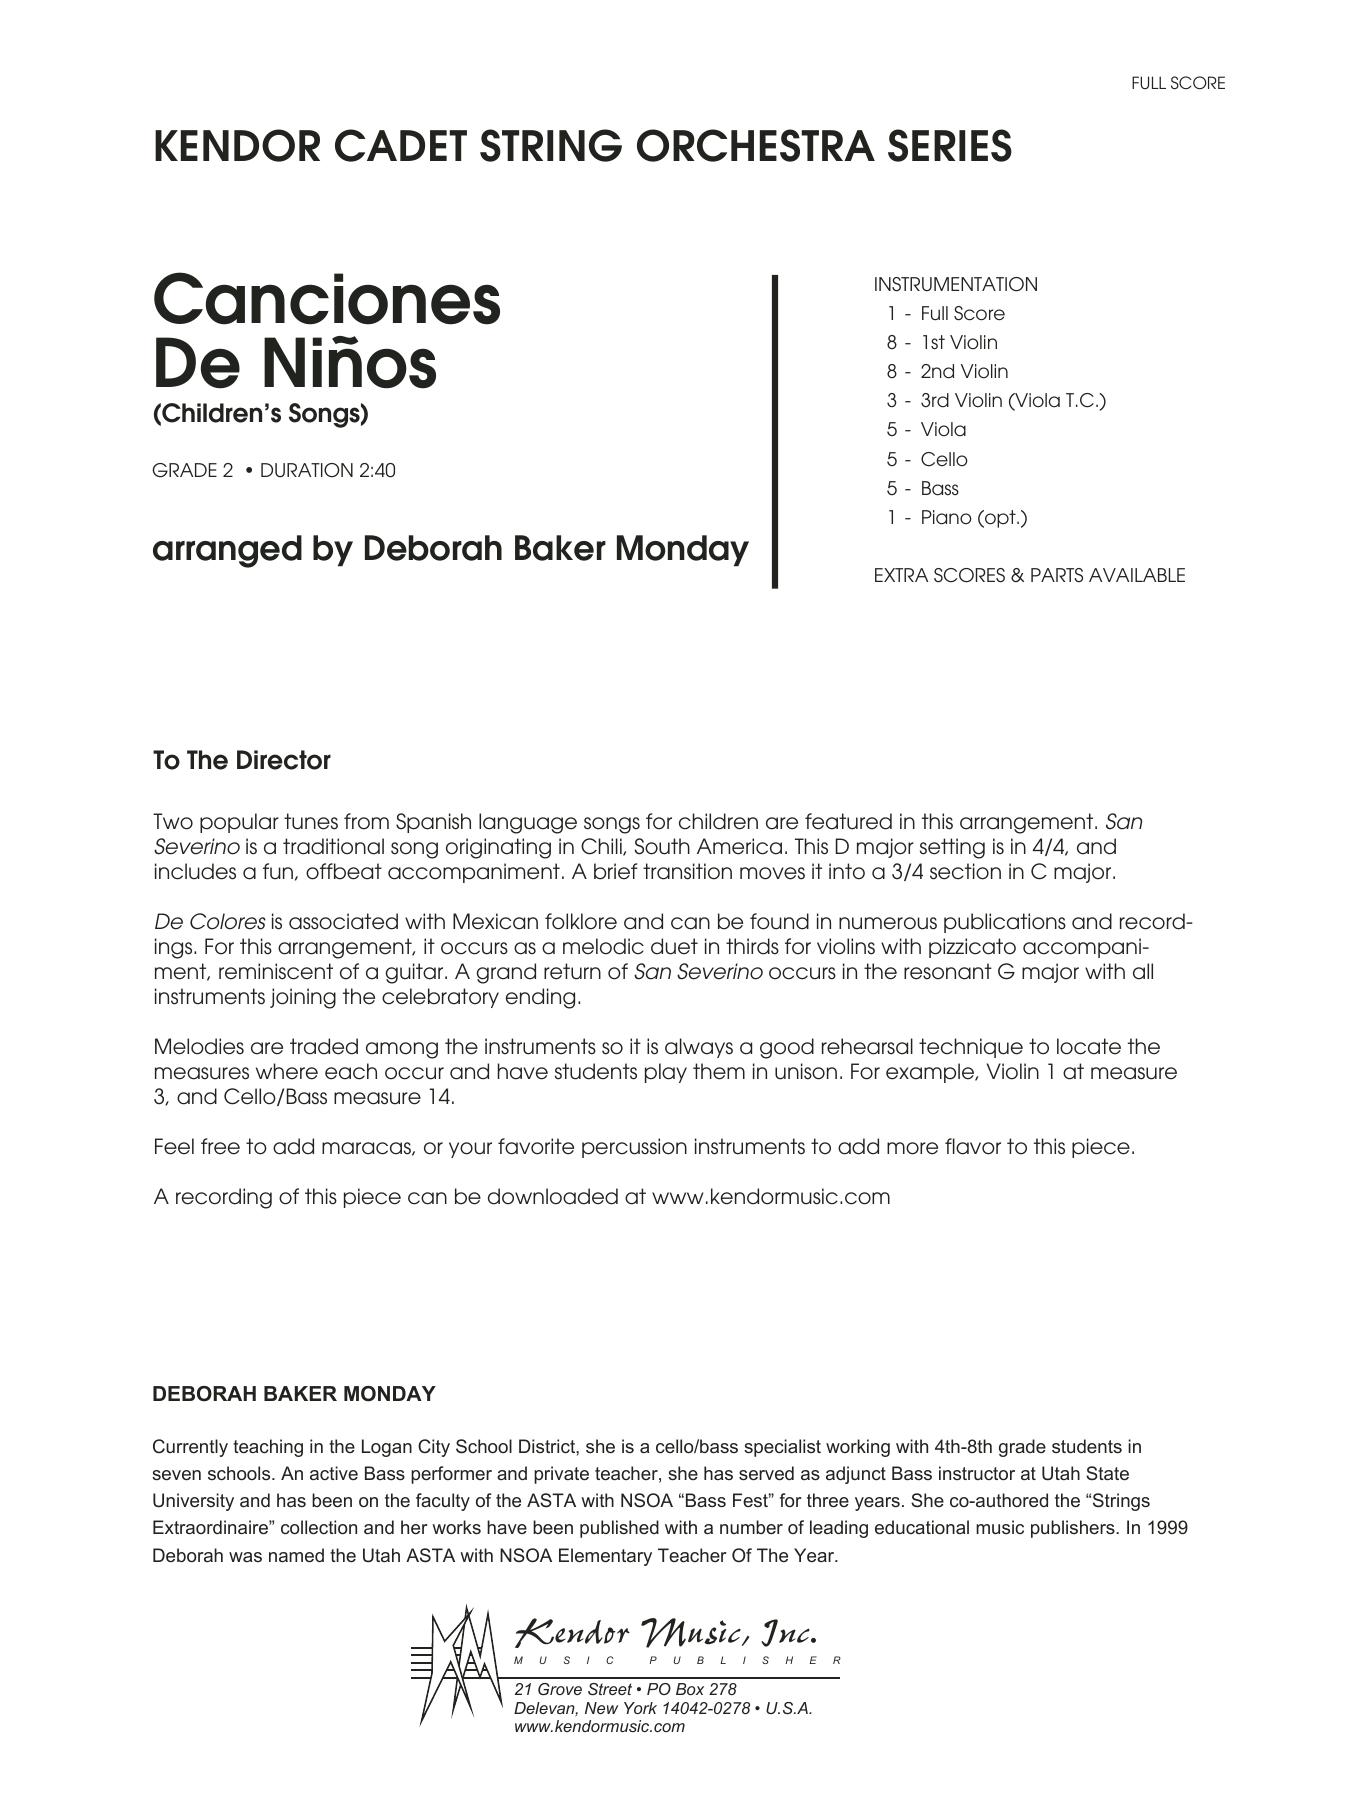 Deborah Baker Monday Canciones De Ninos - Full Score sheet music notes and chords. Download Printable PDF.